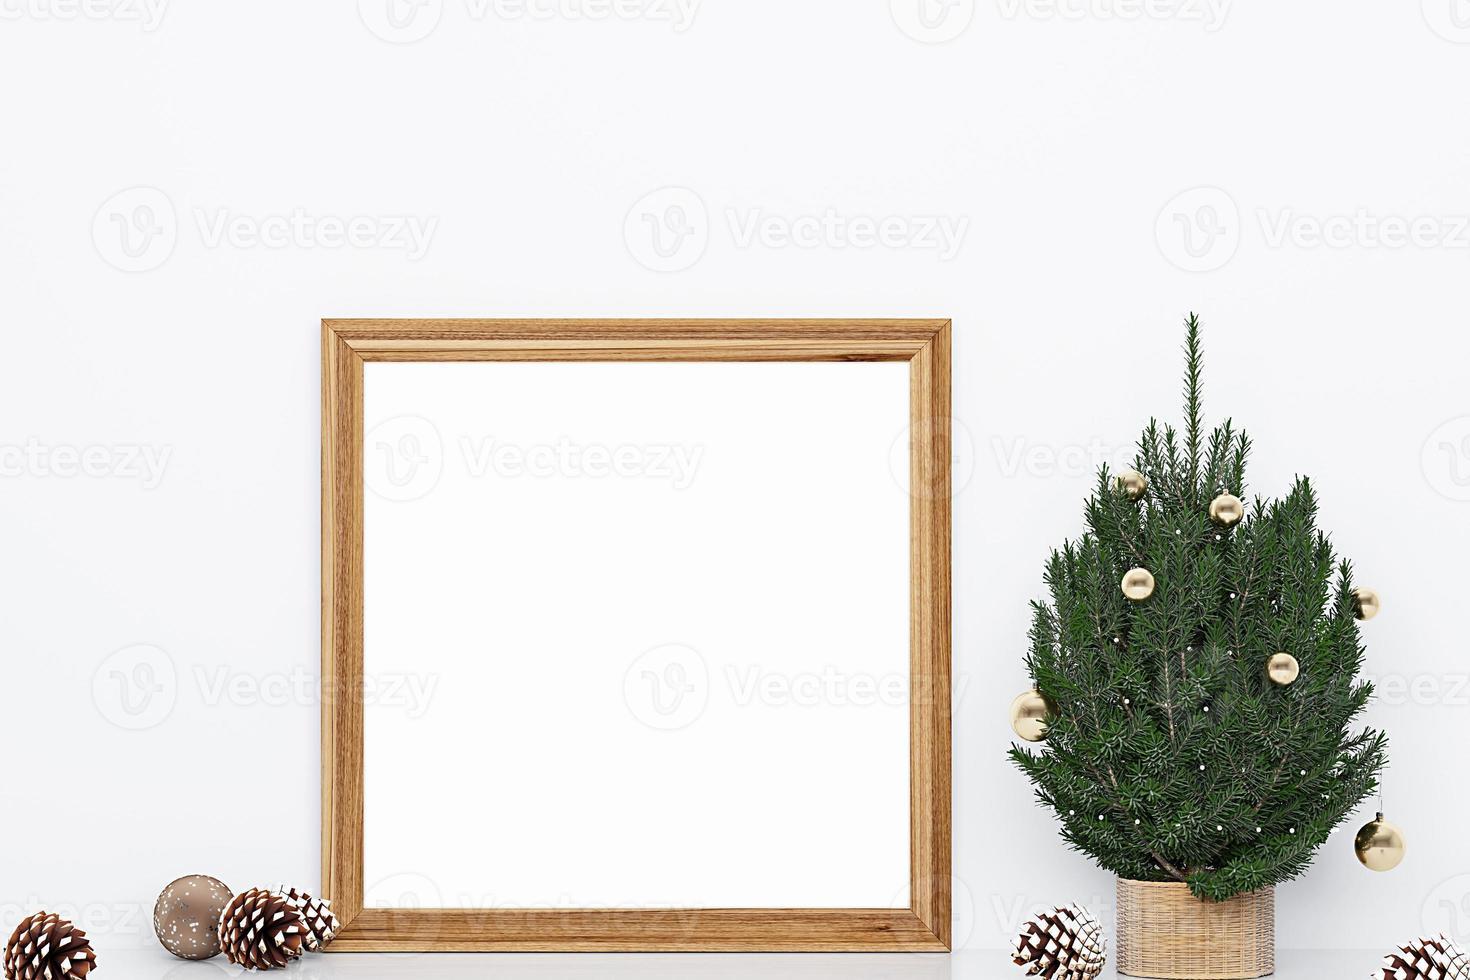 kerstframe mockup-1 foto